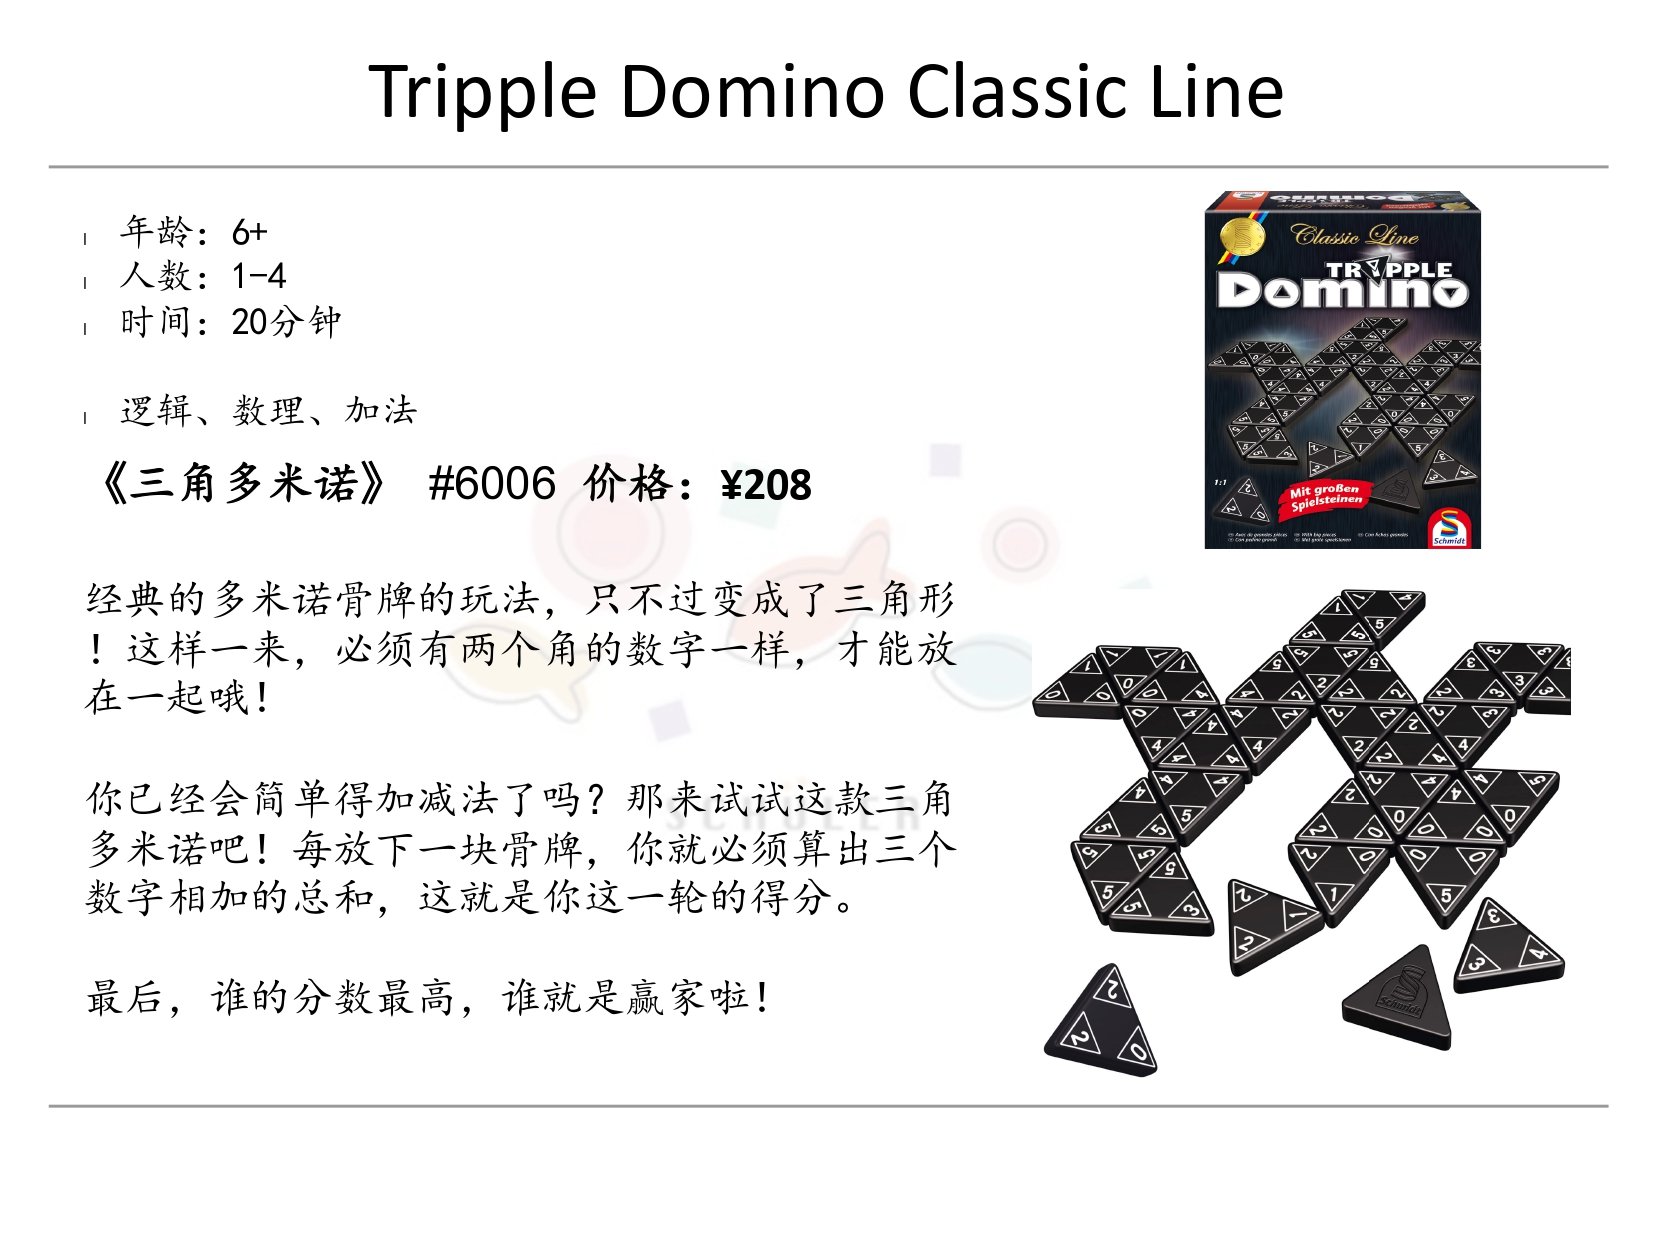 Tripple Domino Classic Line 三角多米诺